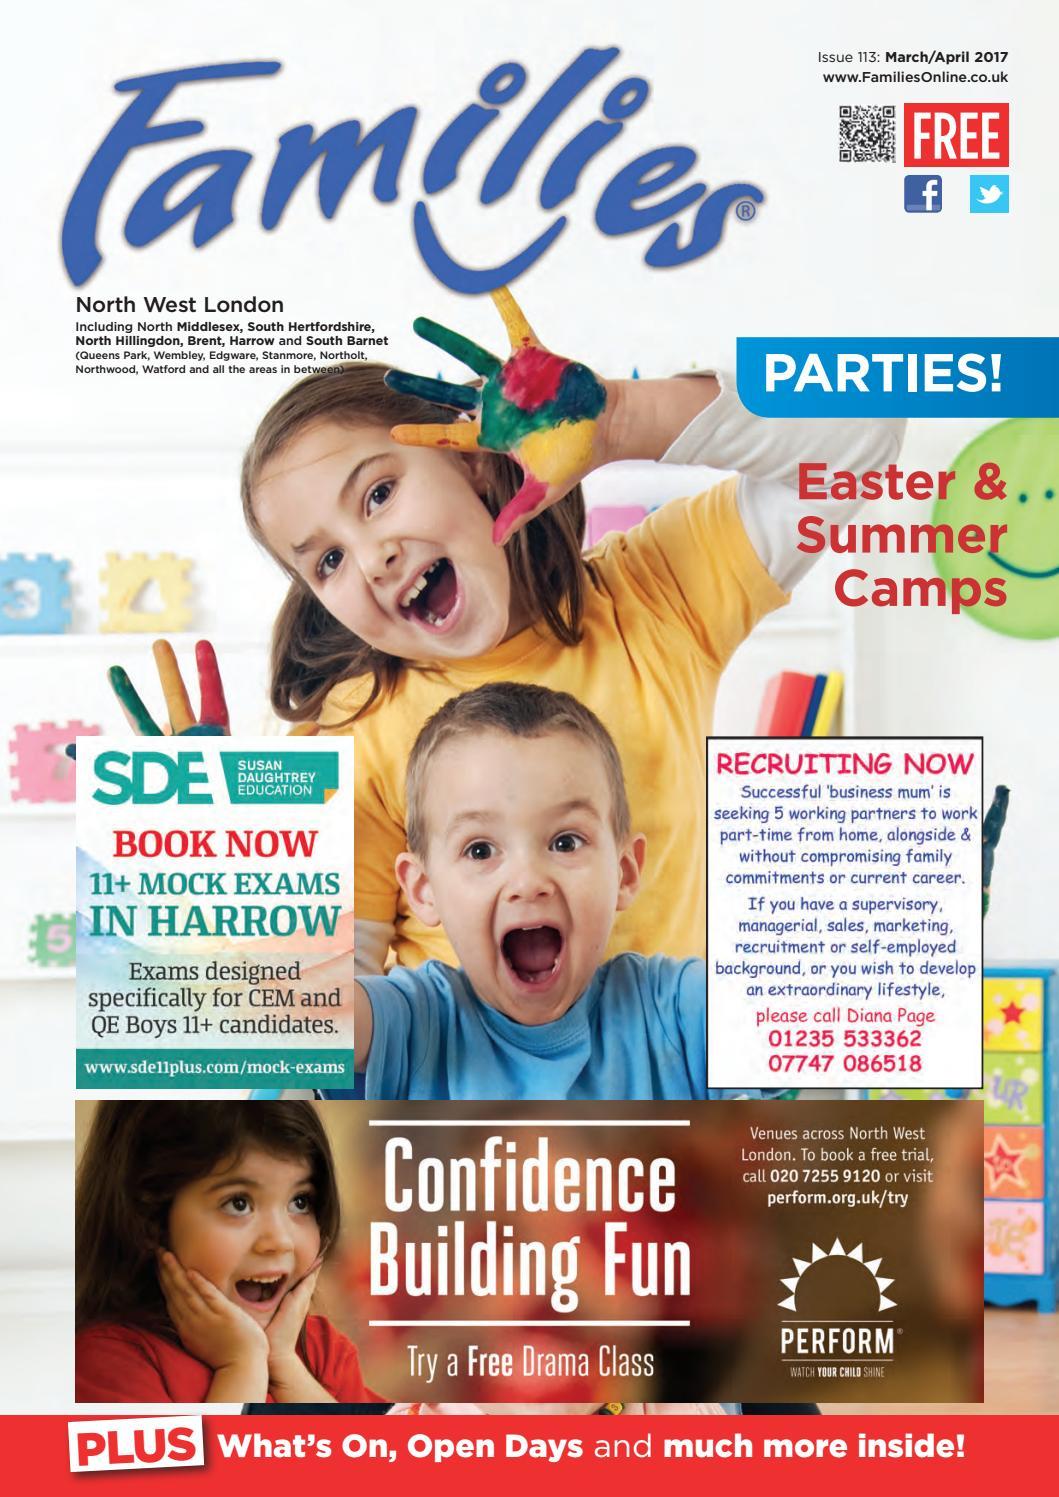 ae2fd0867b5 Families North West London Mar Apr 2017 Issue 113 by Heather ...